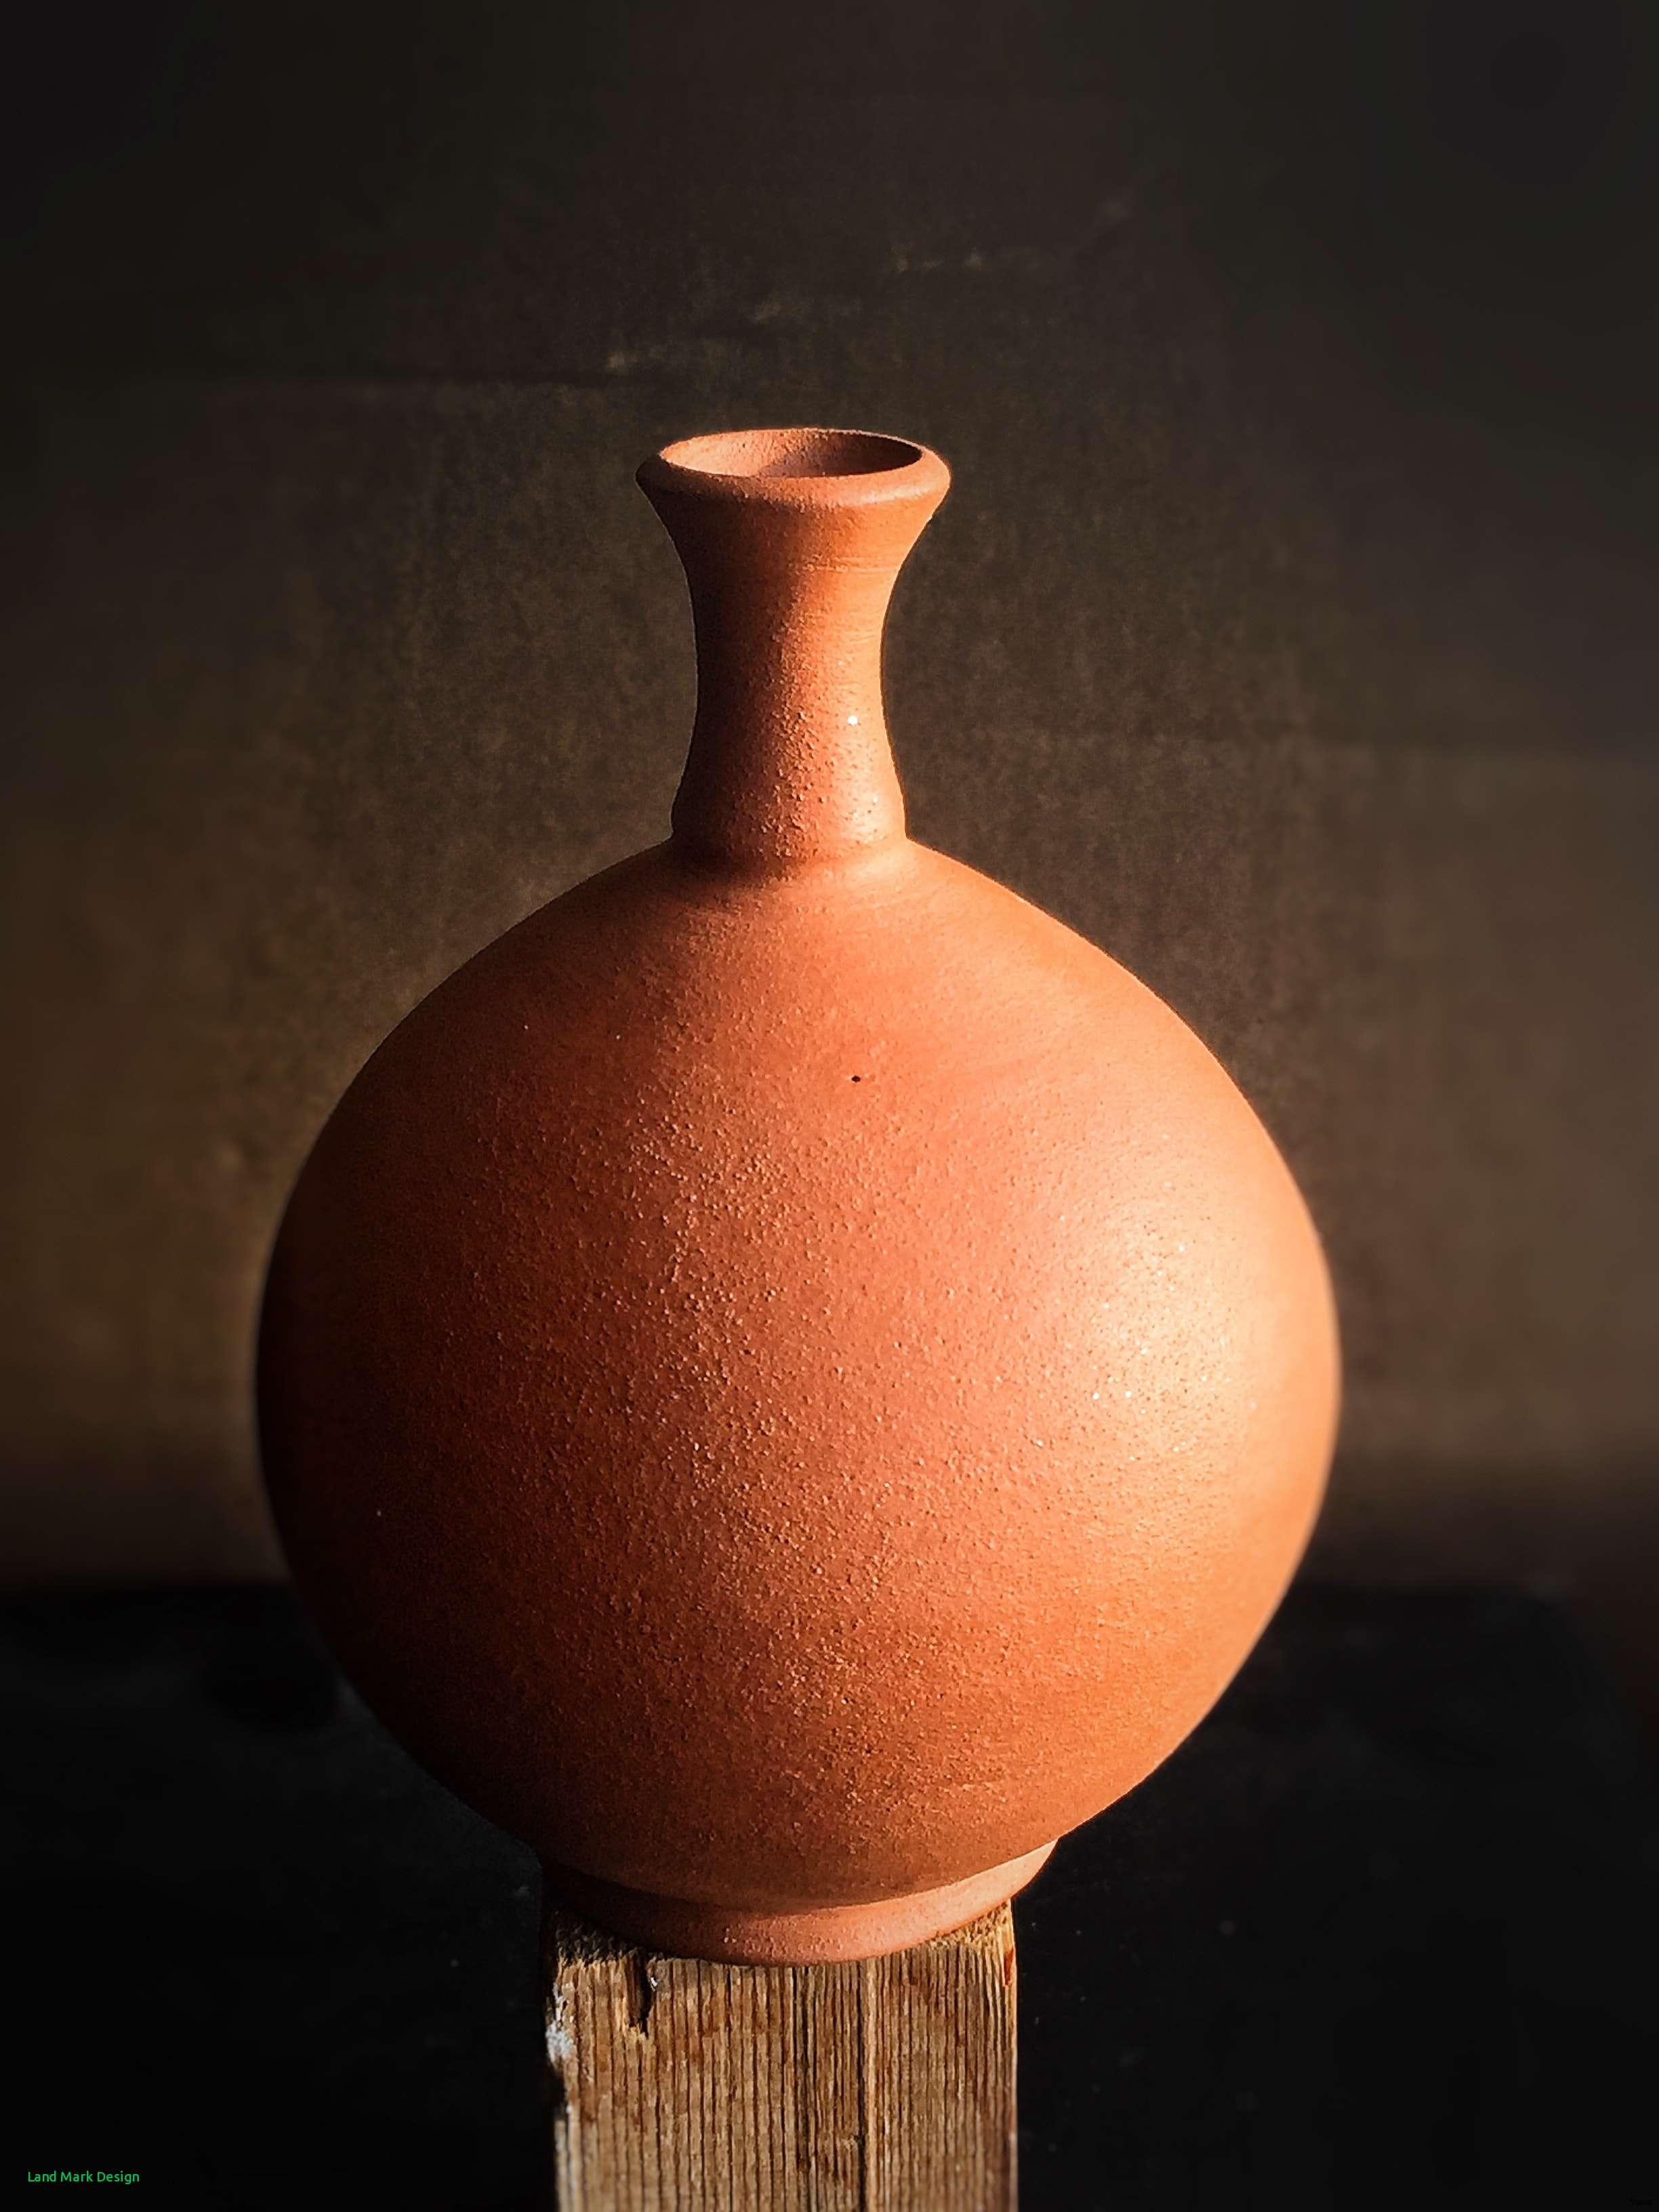 large mosaic floor vases of orange floor vase design home design with tall floor vases powder roomh decorative pottery large vase wood height 36 inchi 0d